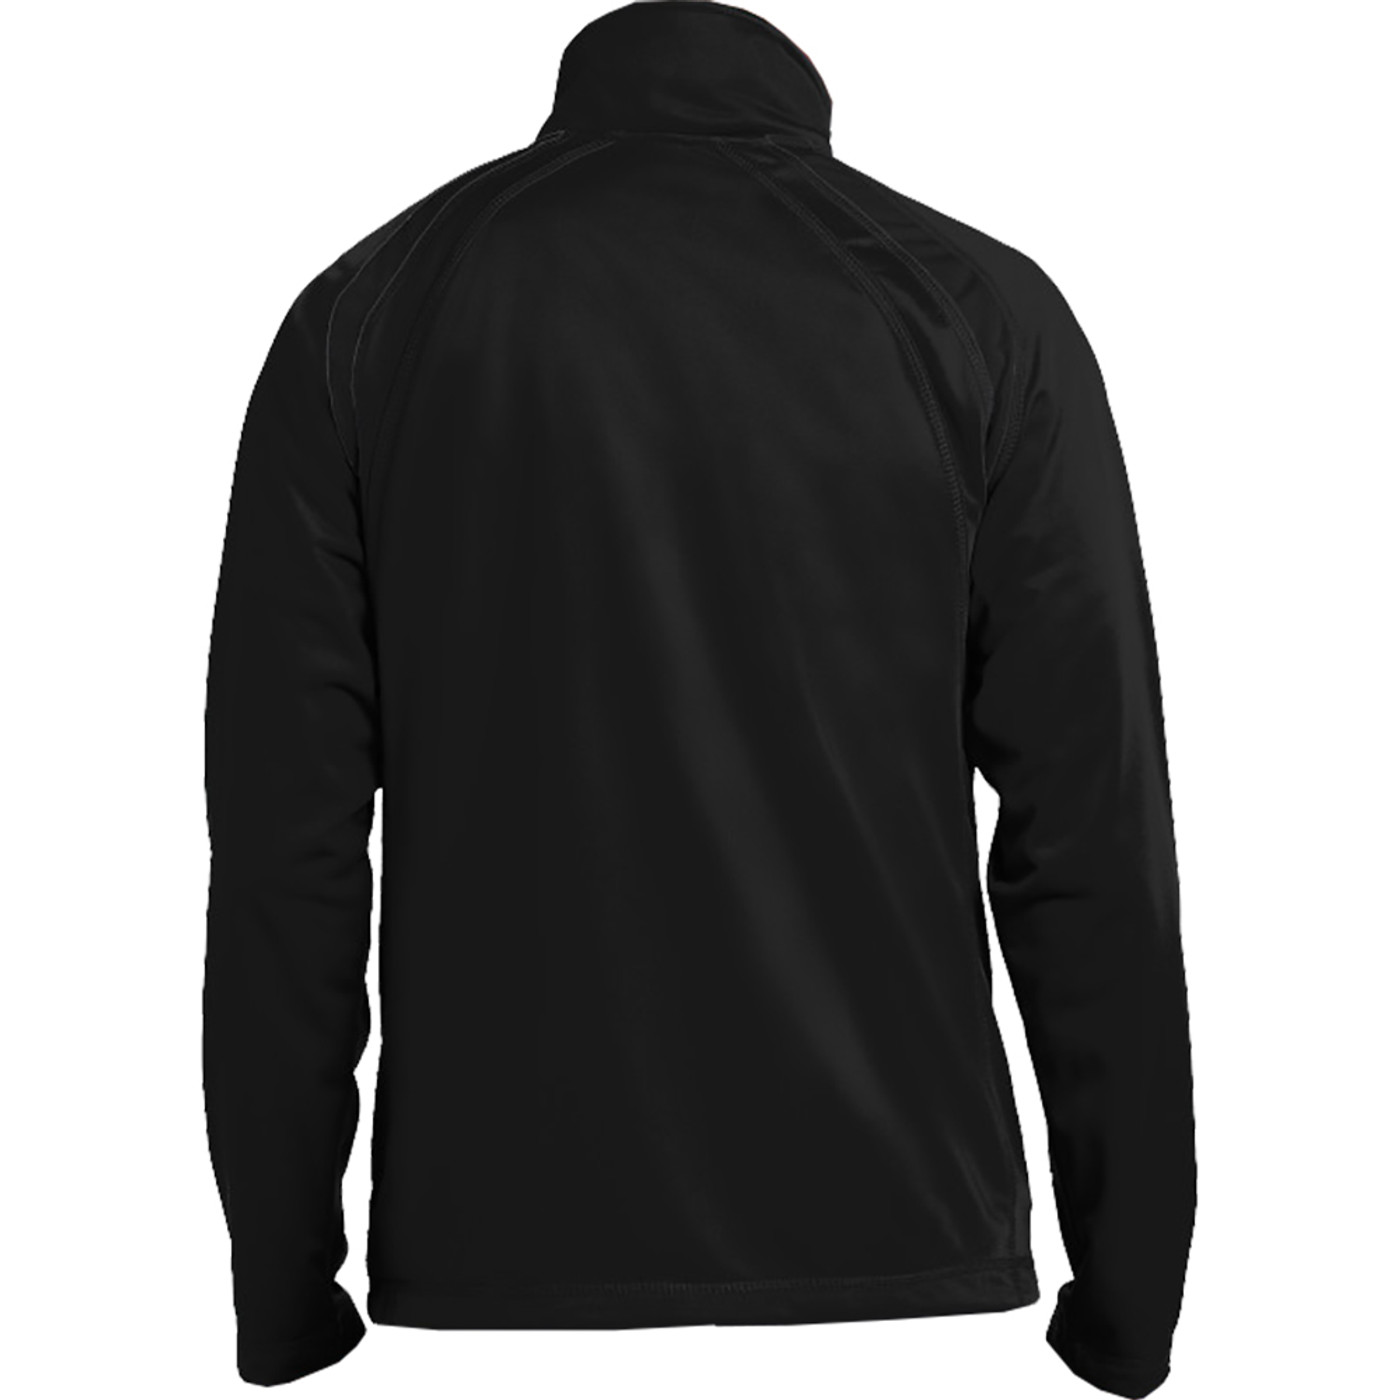 1189N NISOA 4th Official Jacket